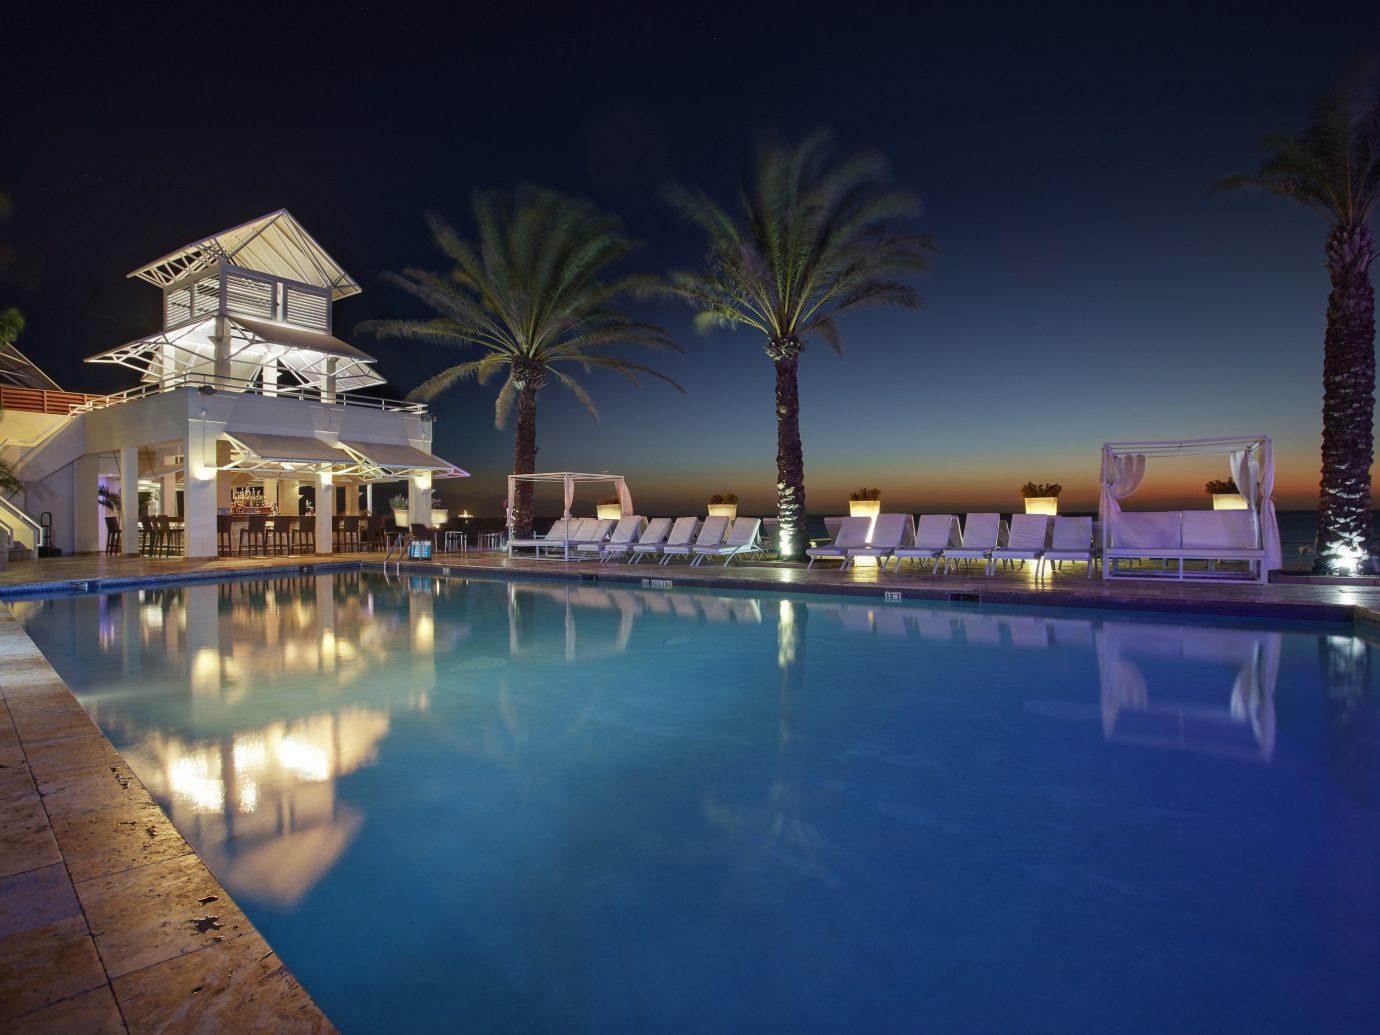 Hotels swimming pool property Resort night estate reflecting pool resort town mansion condominium shore